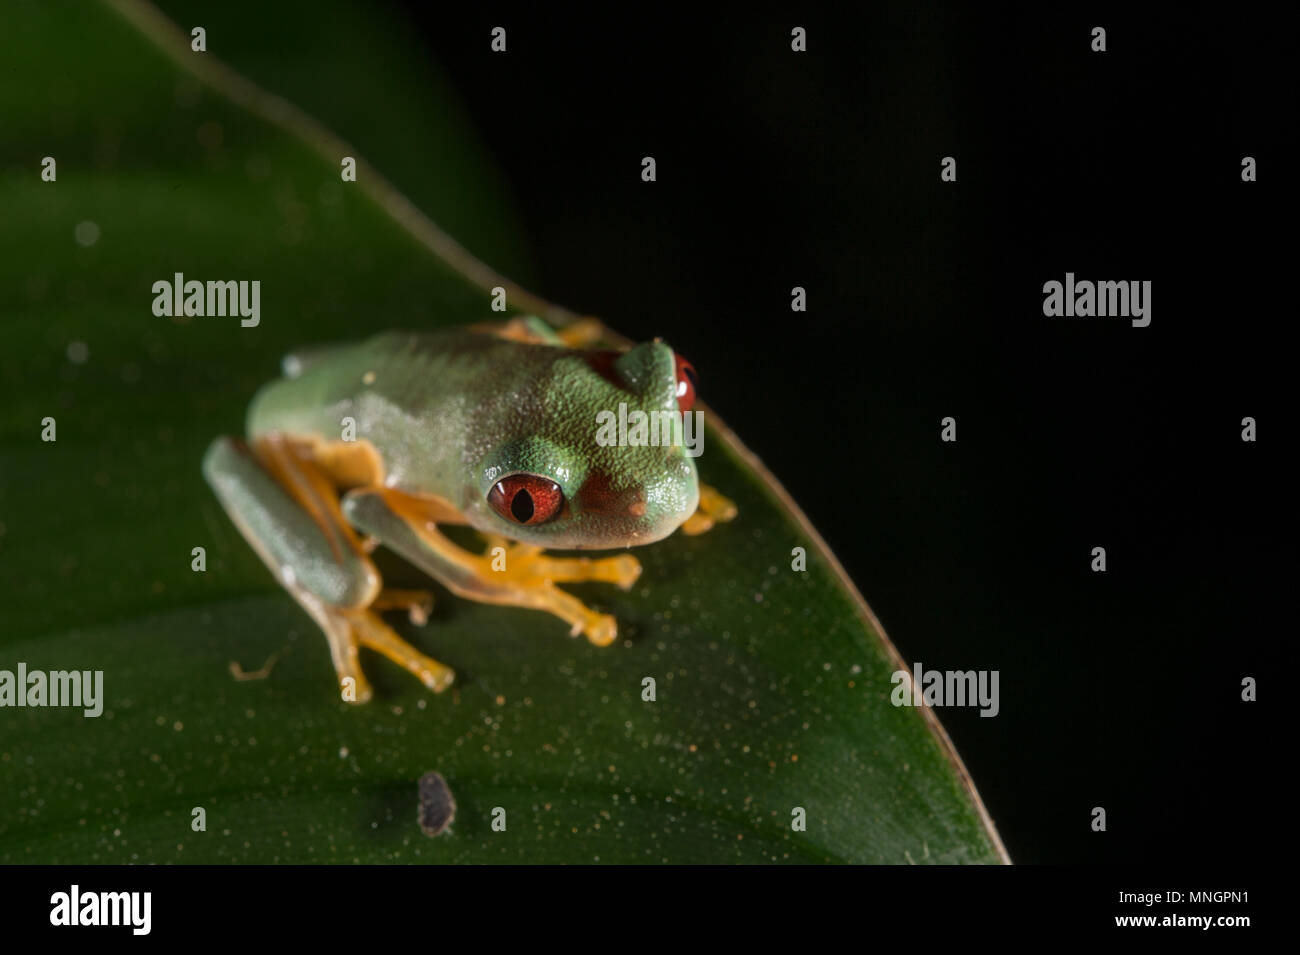 Orang-sided Gliding Leaf Frog, Agalychnis spurrelli, Hylidae, Manuel Antonio National Park, Costa Rica, Centroamerica - Stock Image